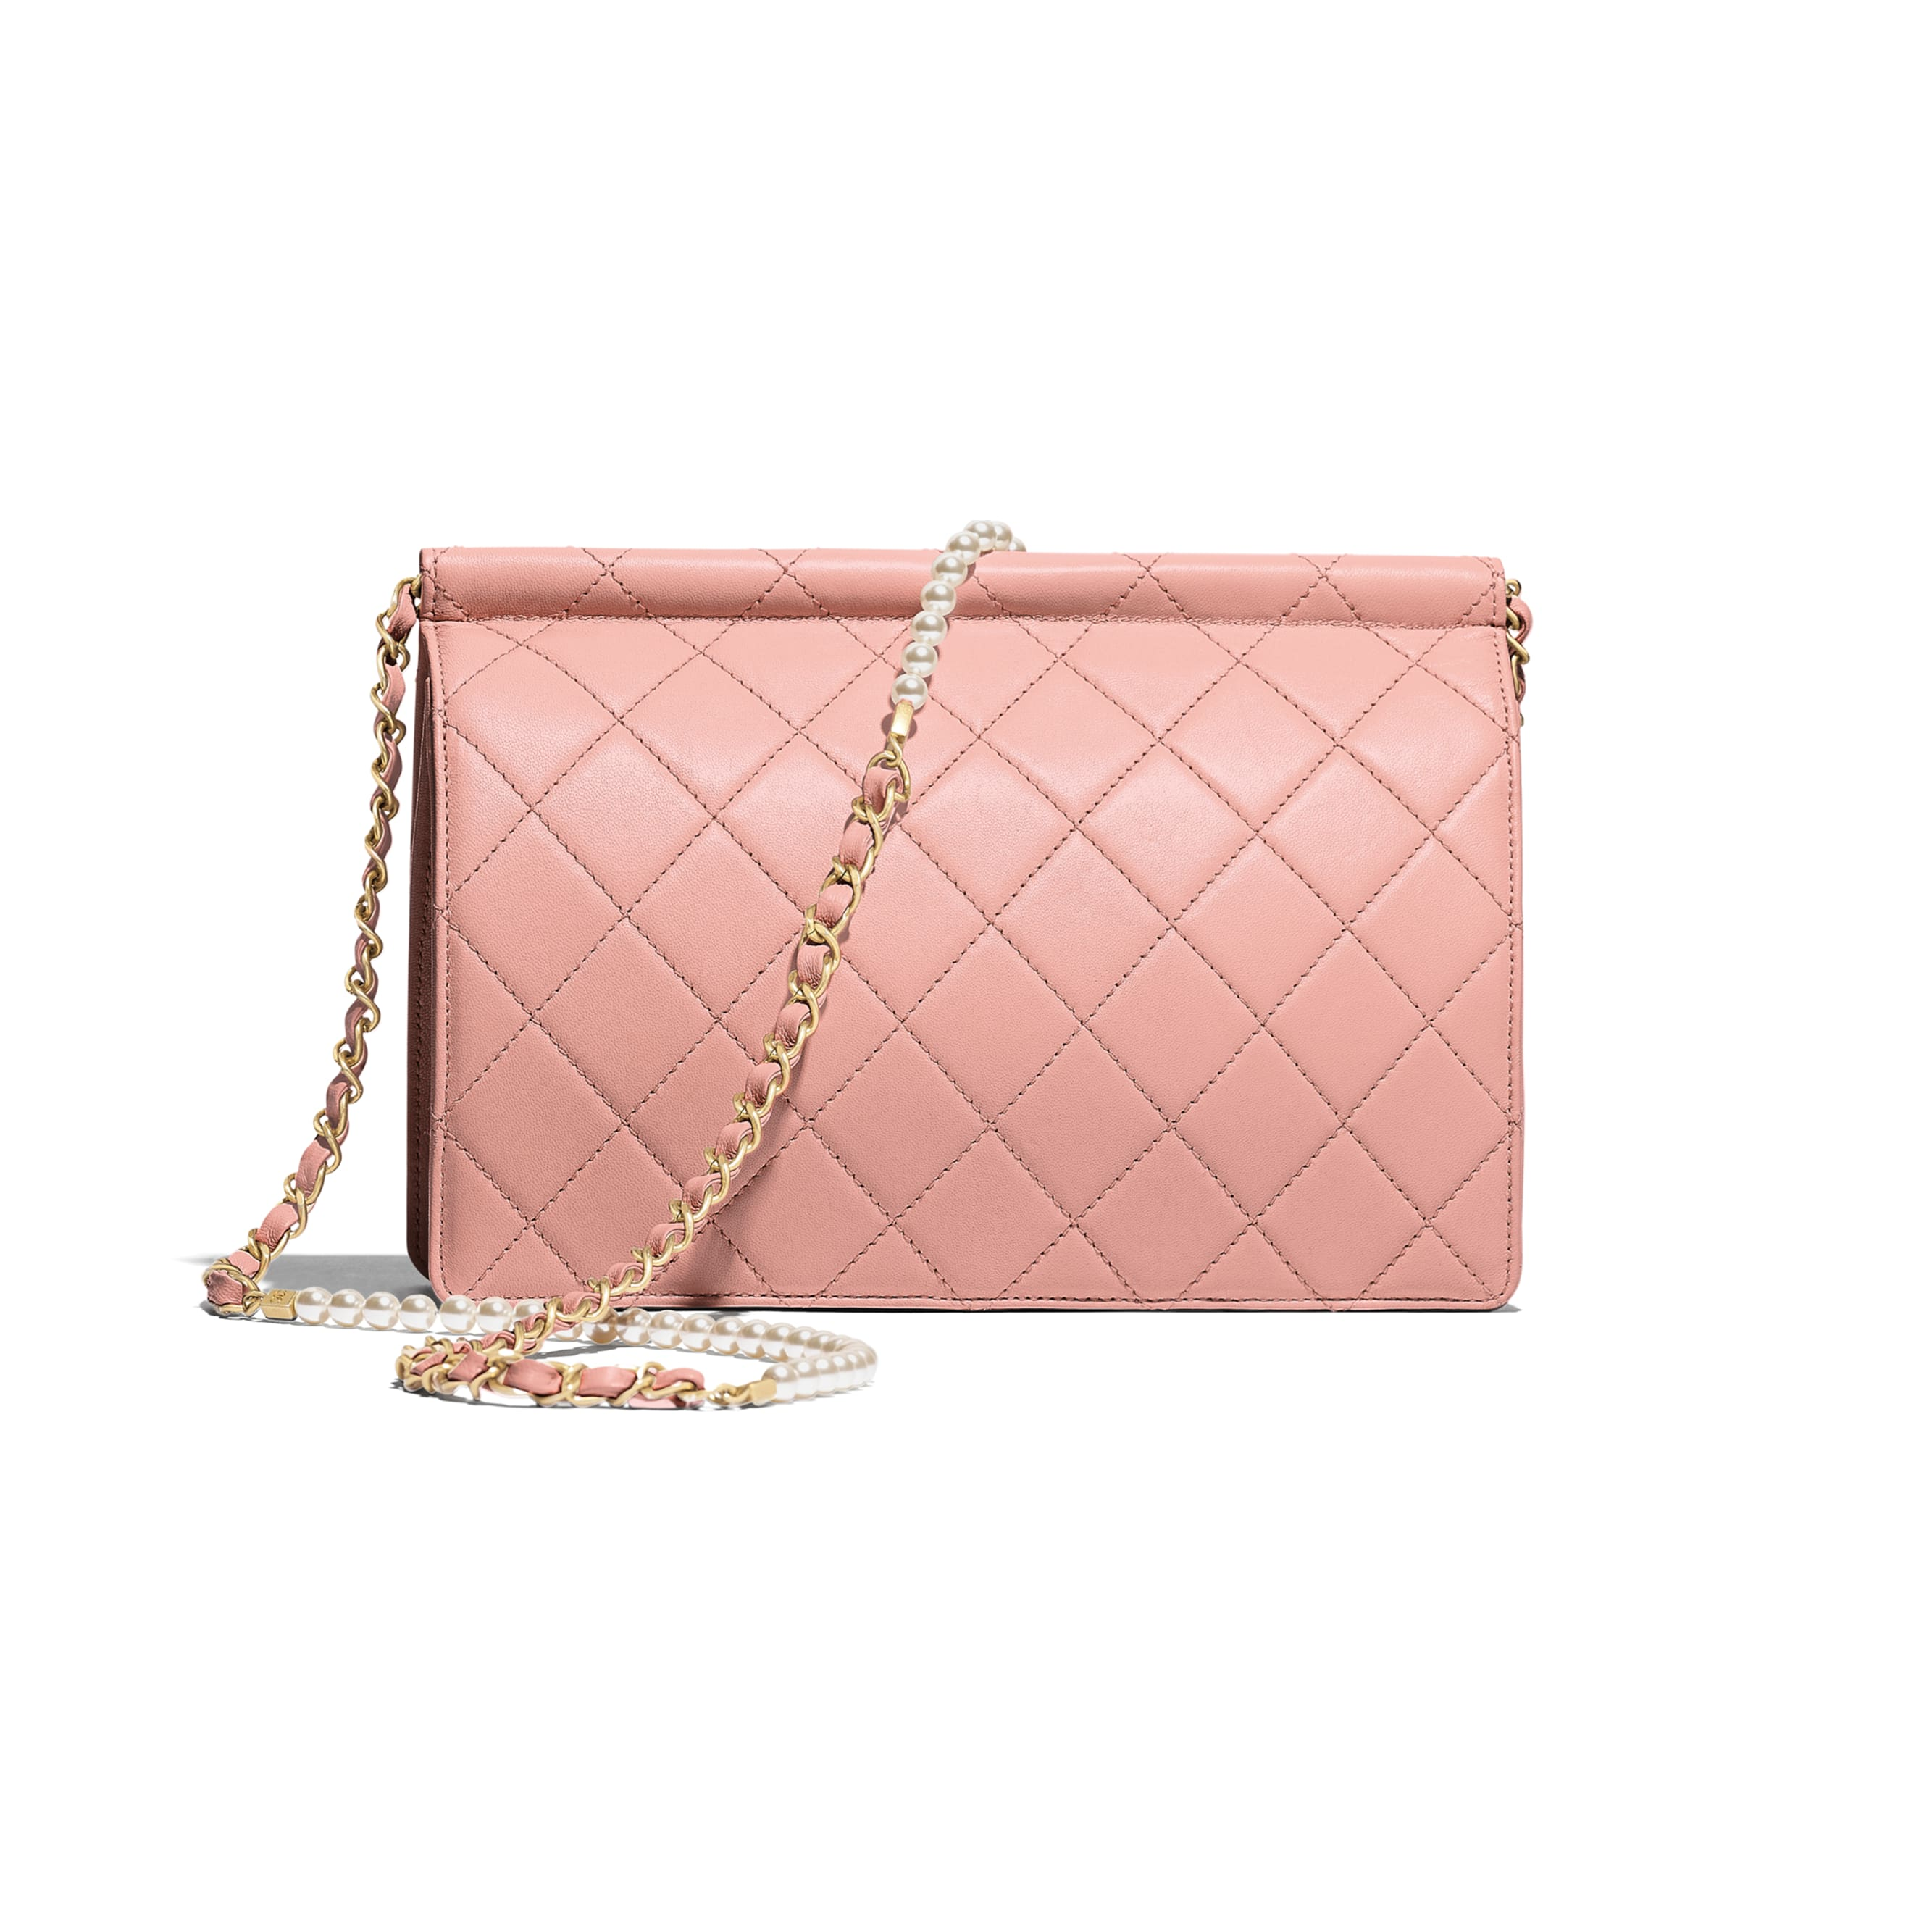 Flap Bag - Pink - Lambskin, Imitation Pearls & Gold-Tone Metal - Alternative view - see standard sized version